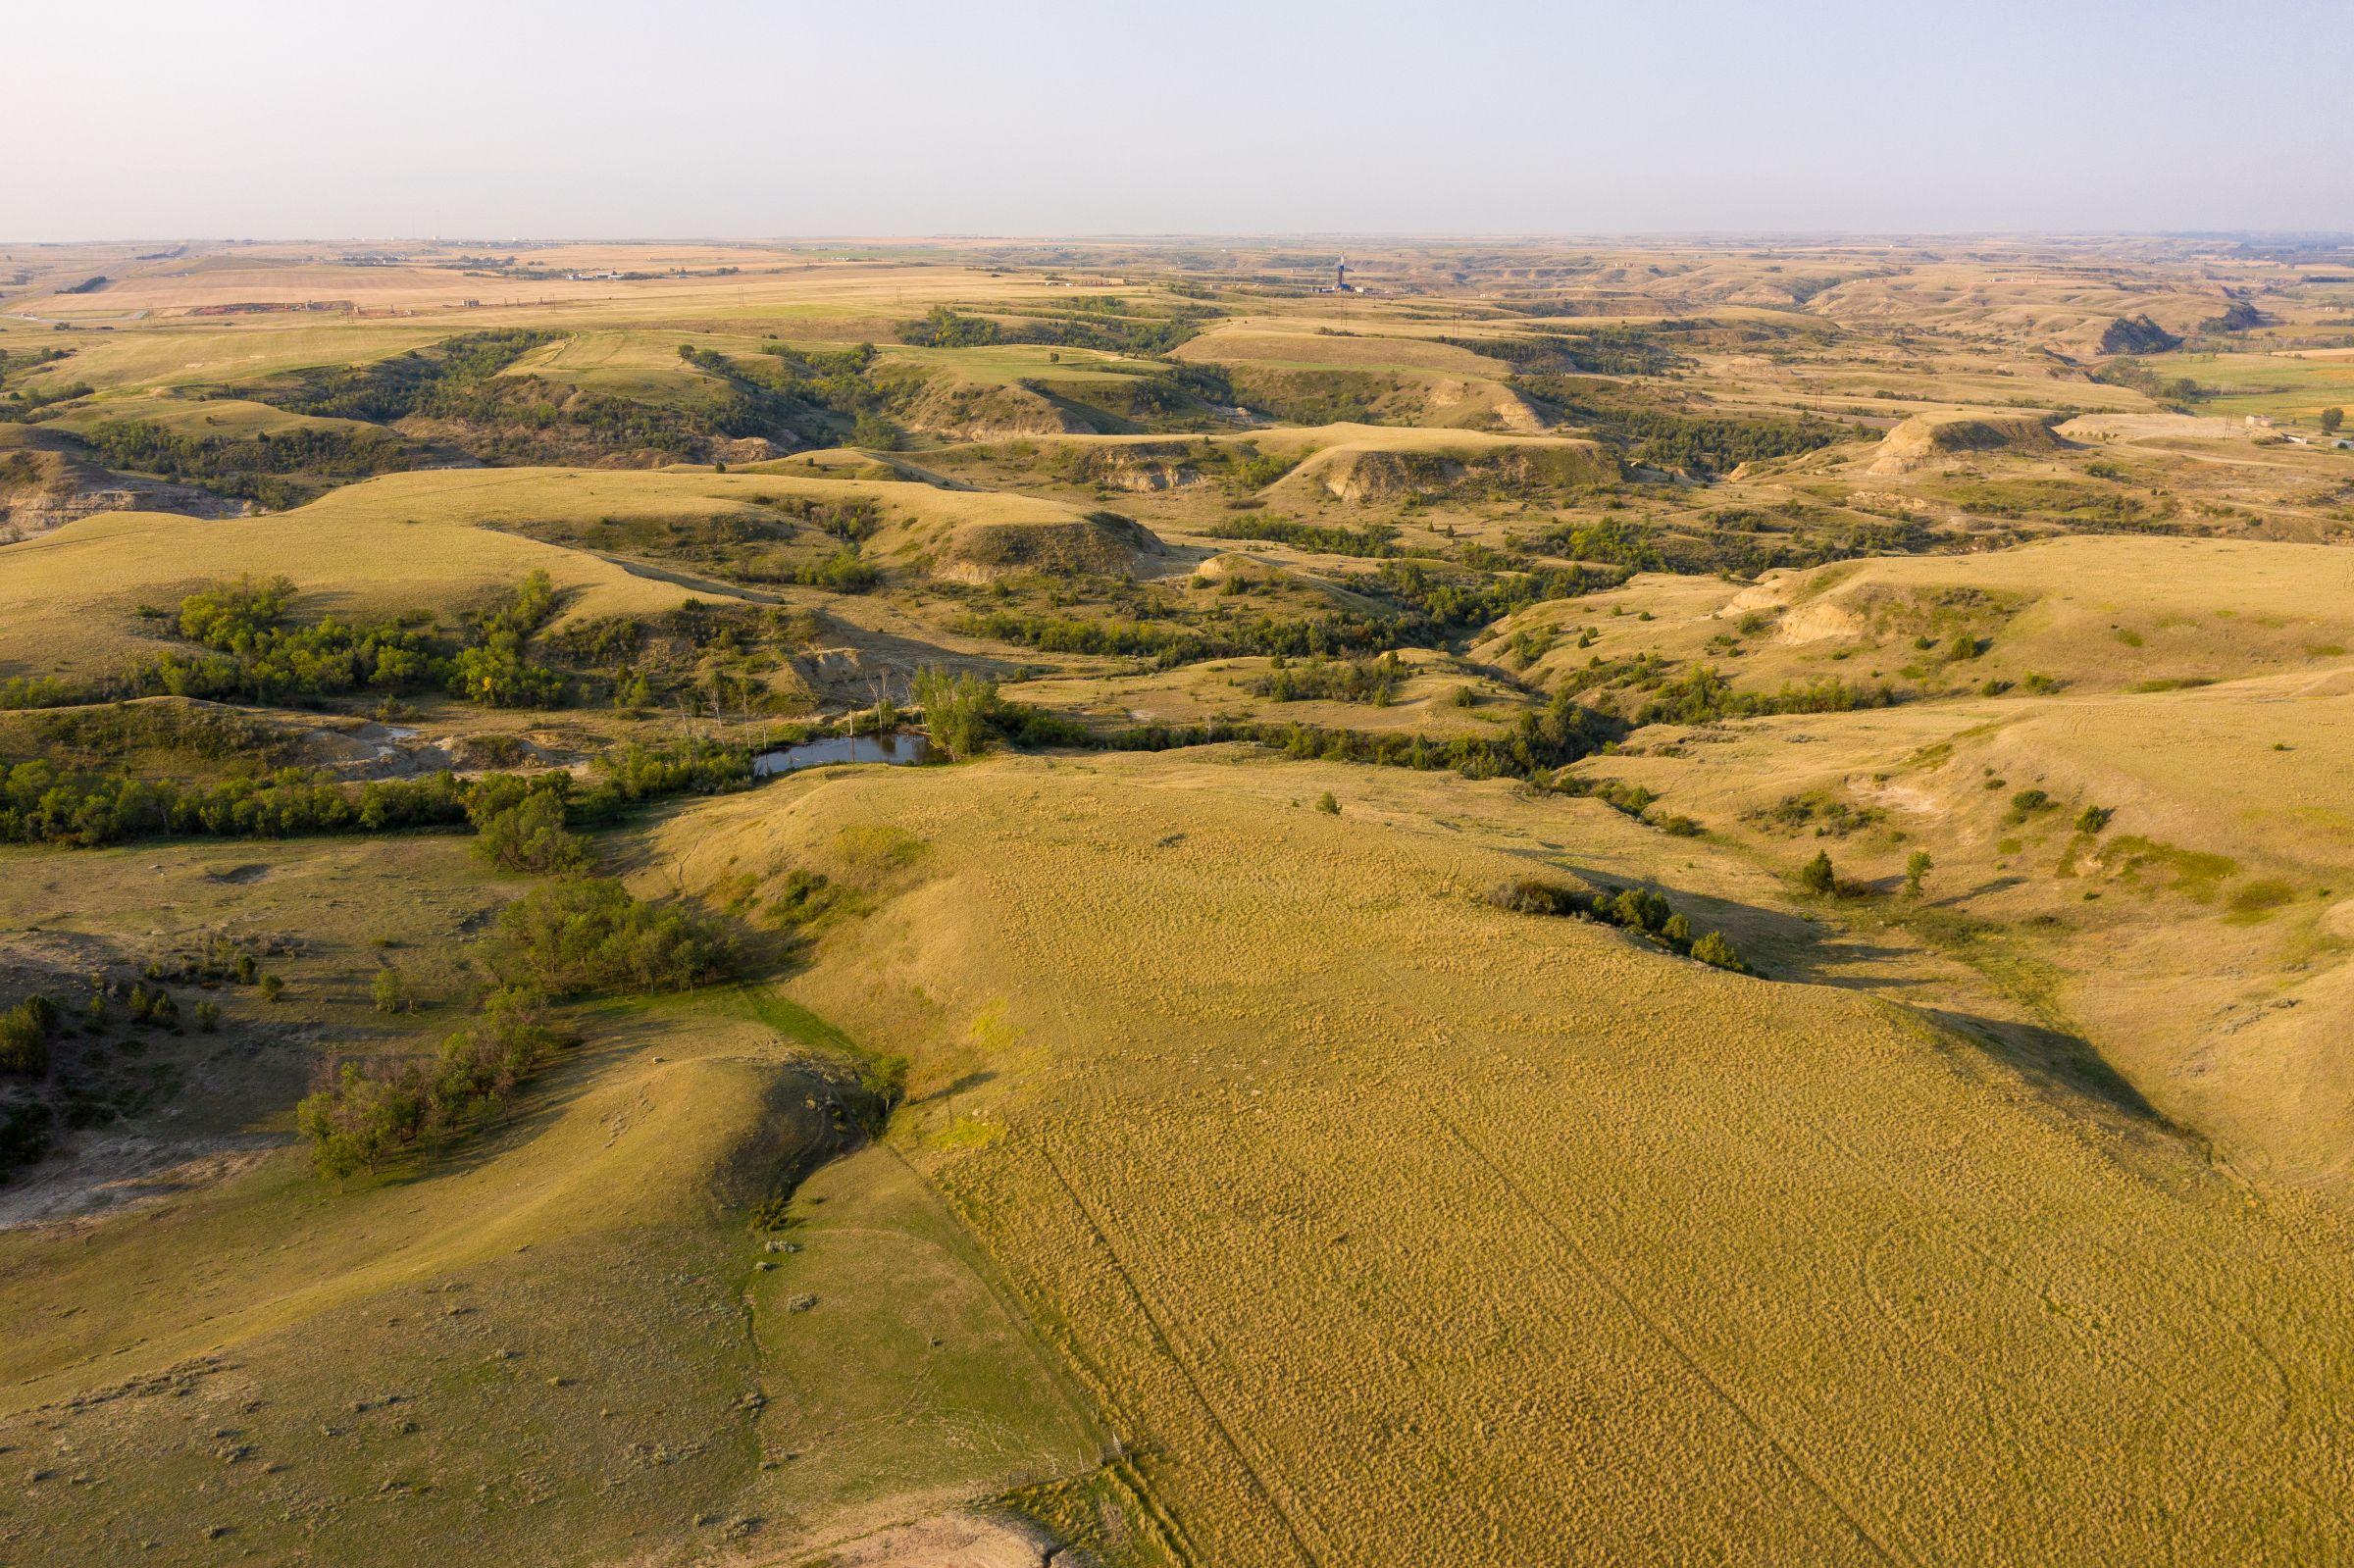 auctions-land-mckenzie-county-north-dakota-270-acres-listing-number-15735-1-2021-09-09-235540.jpeg